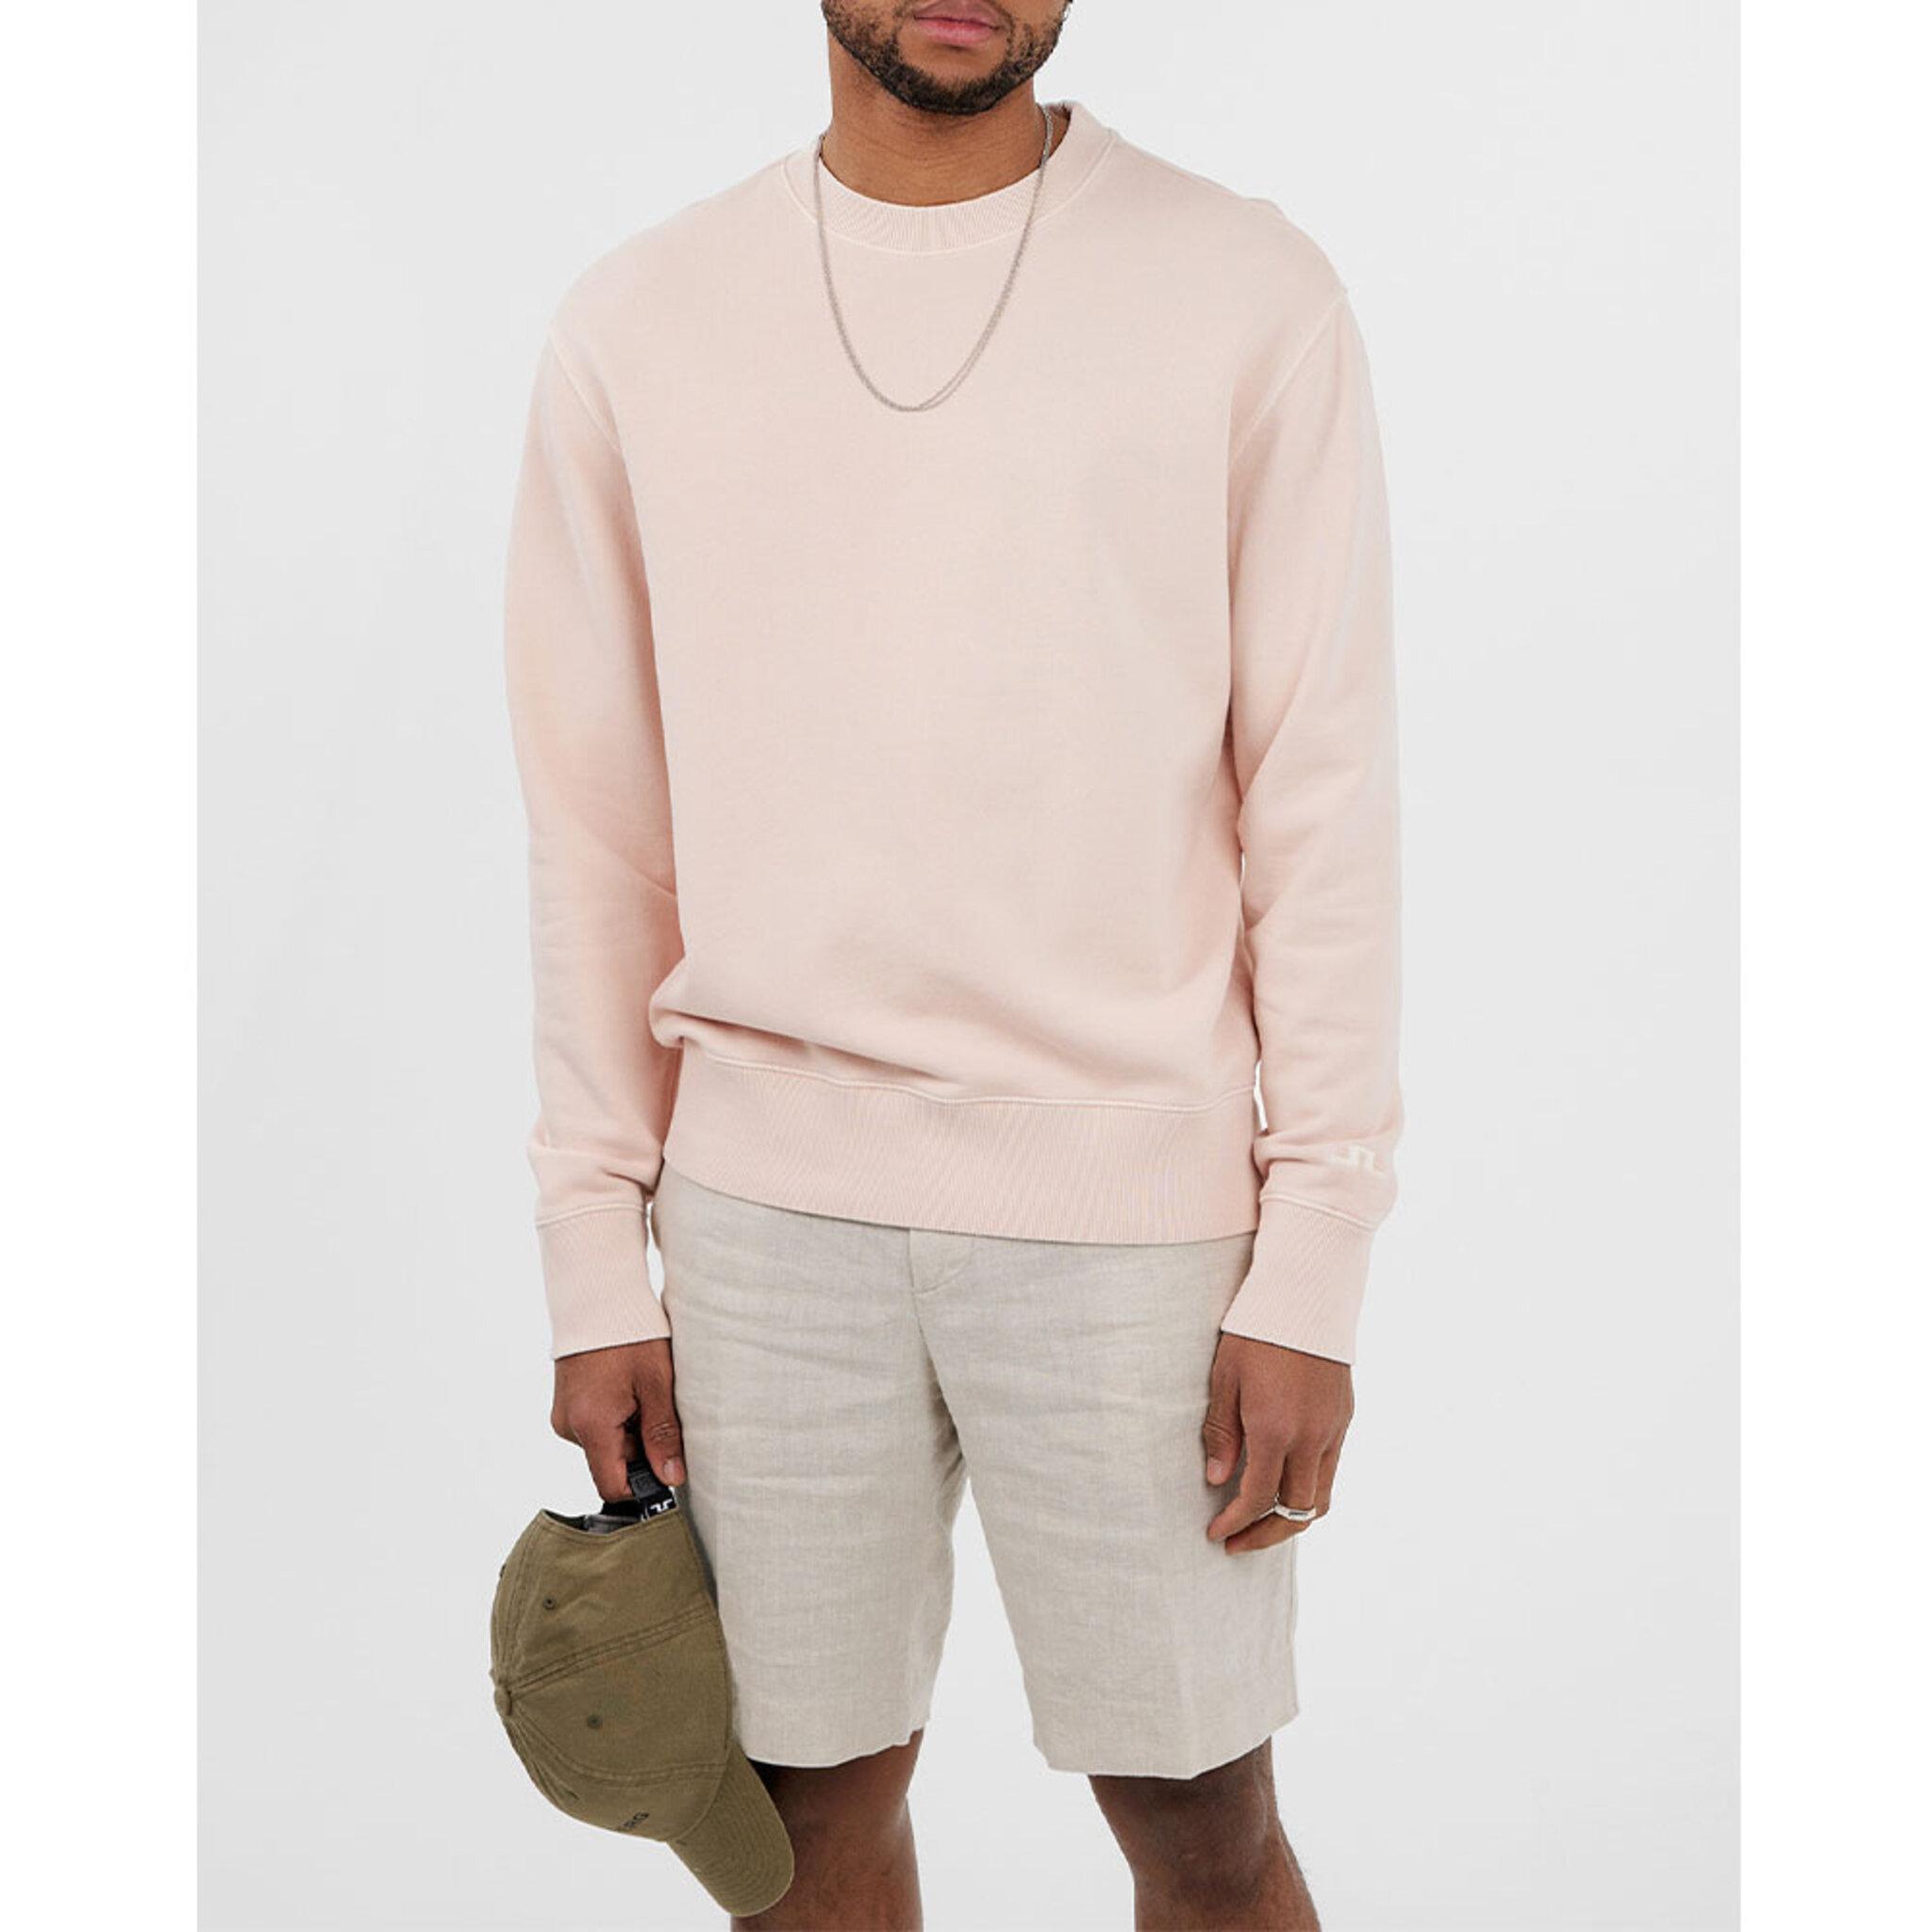 Hurl Garment Dye Sweatshirt